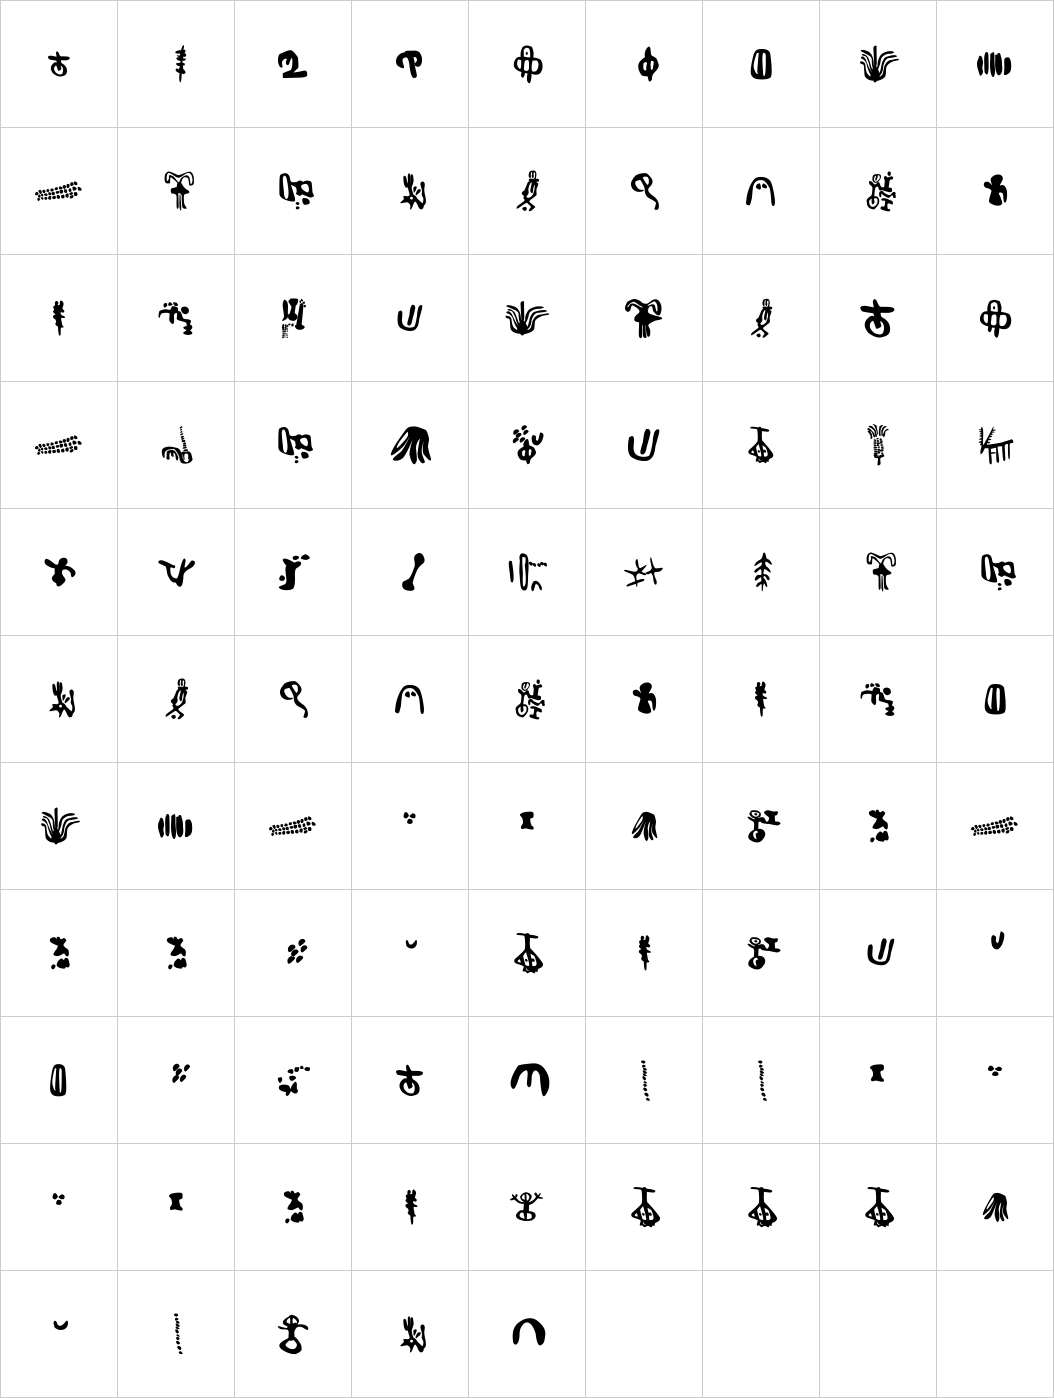 Inga Stone Signs Font Image Script fonts download, Free